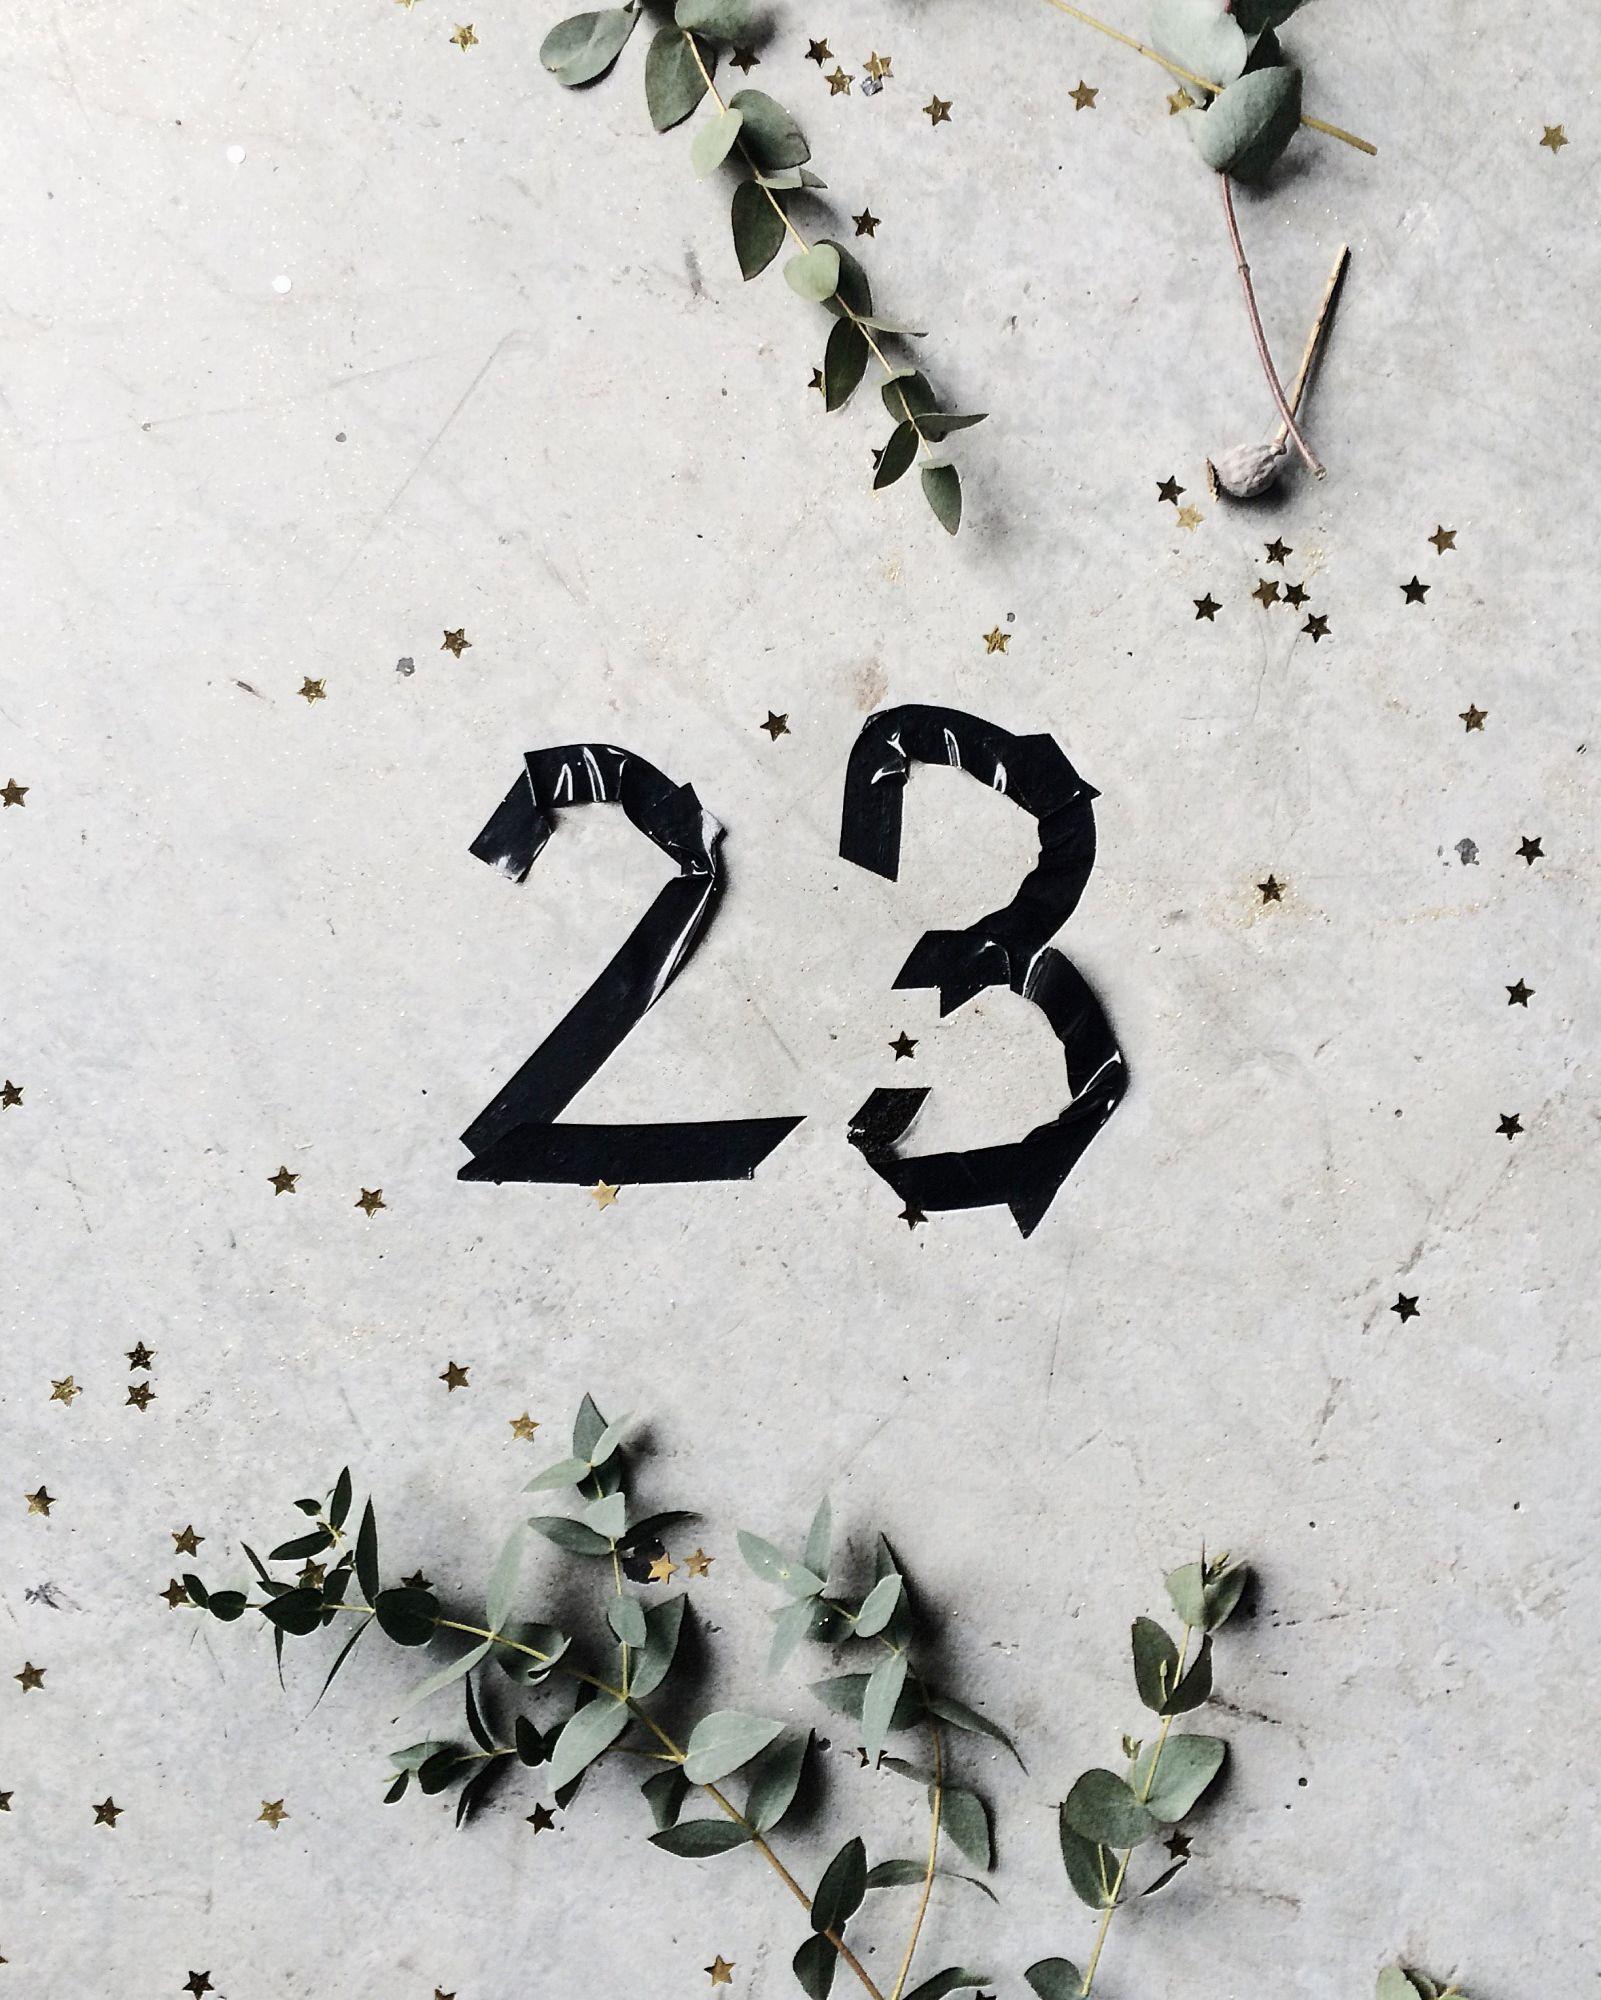 23 en numérologie